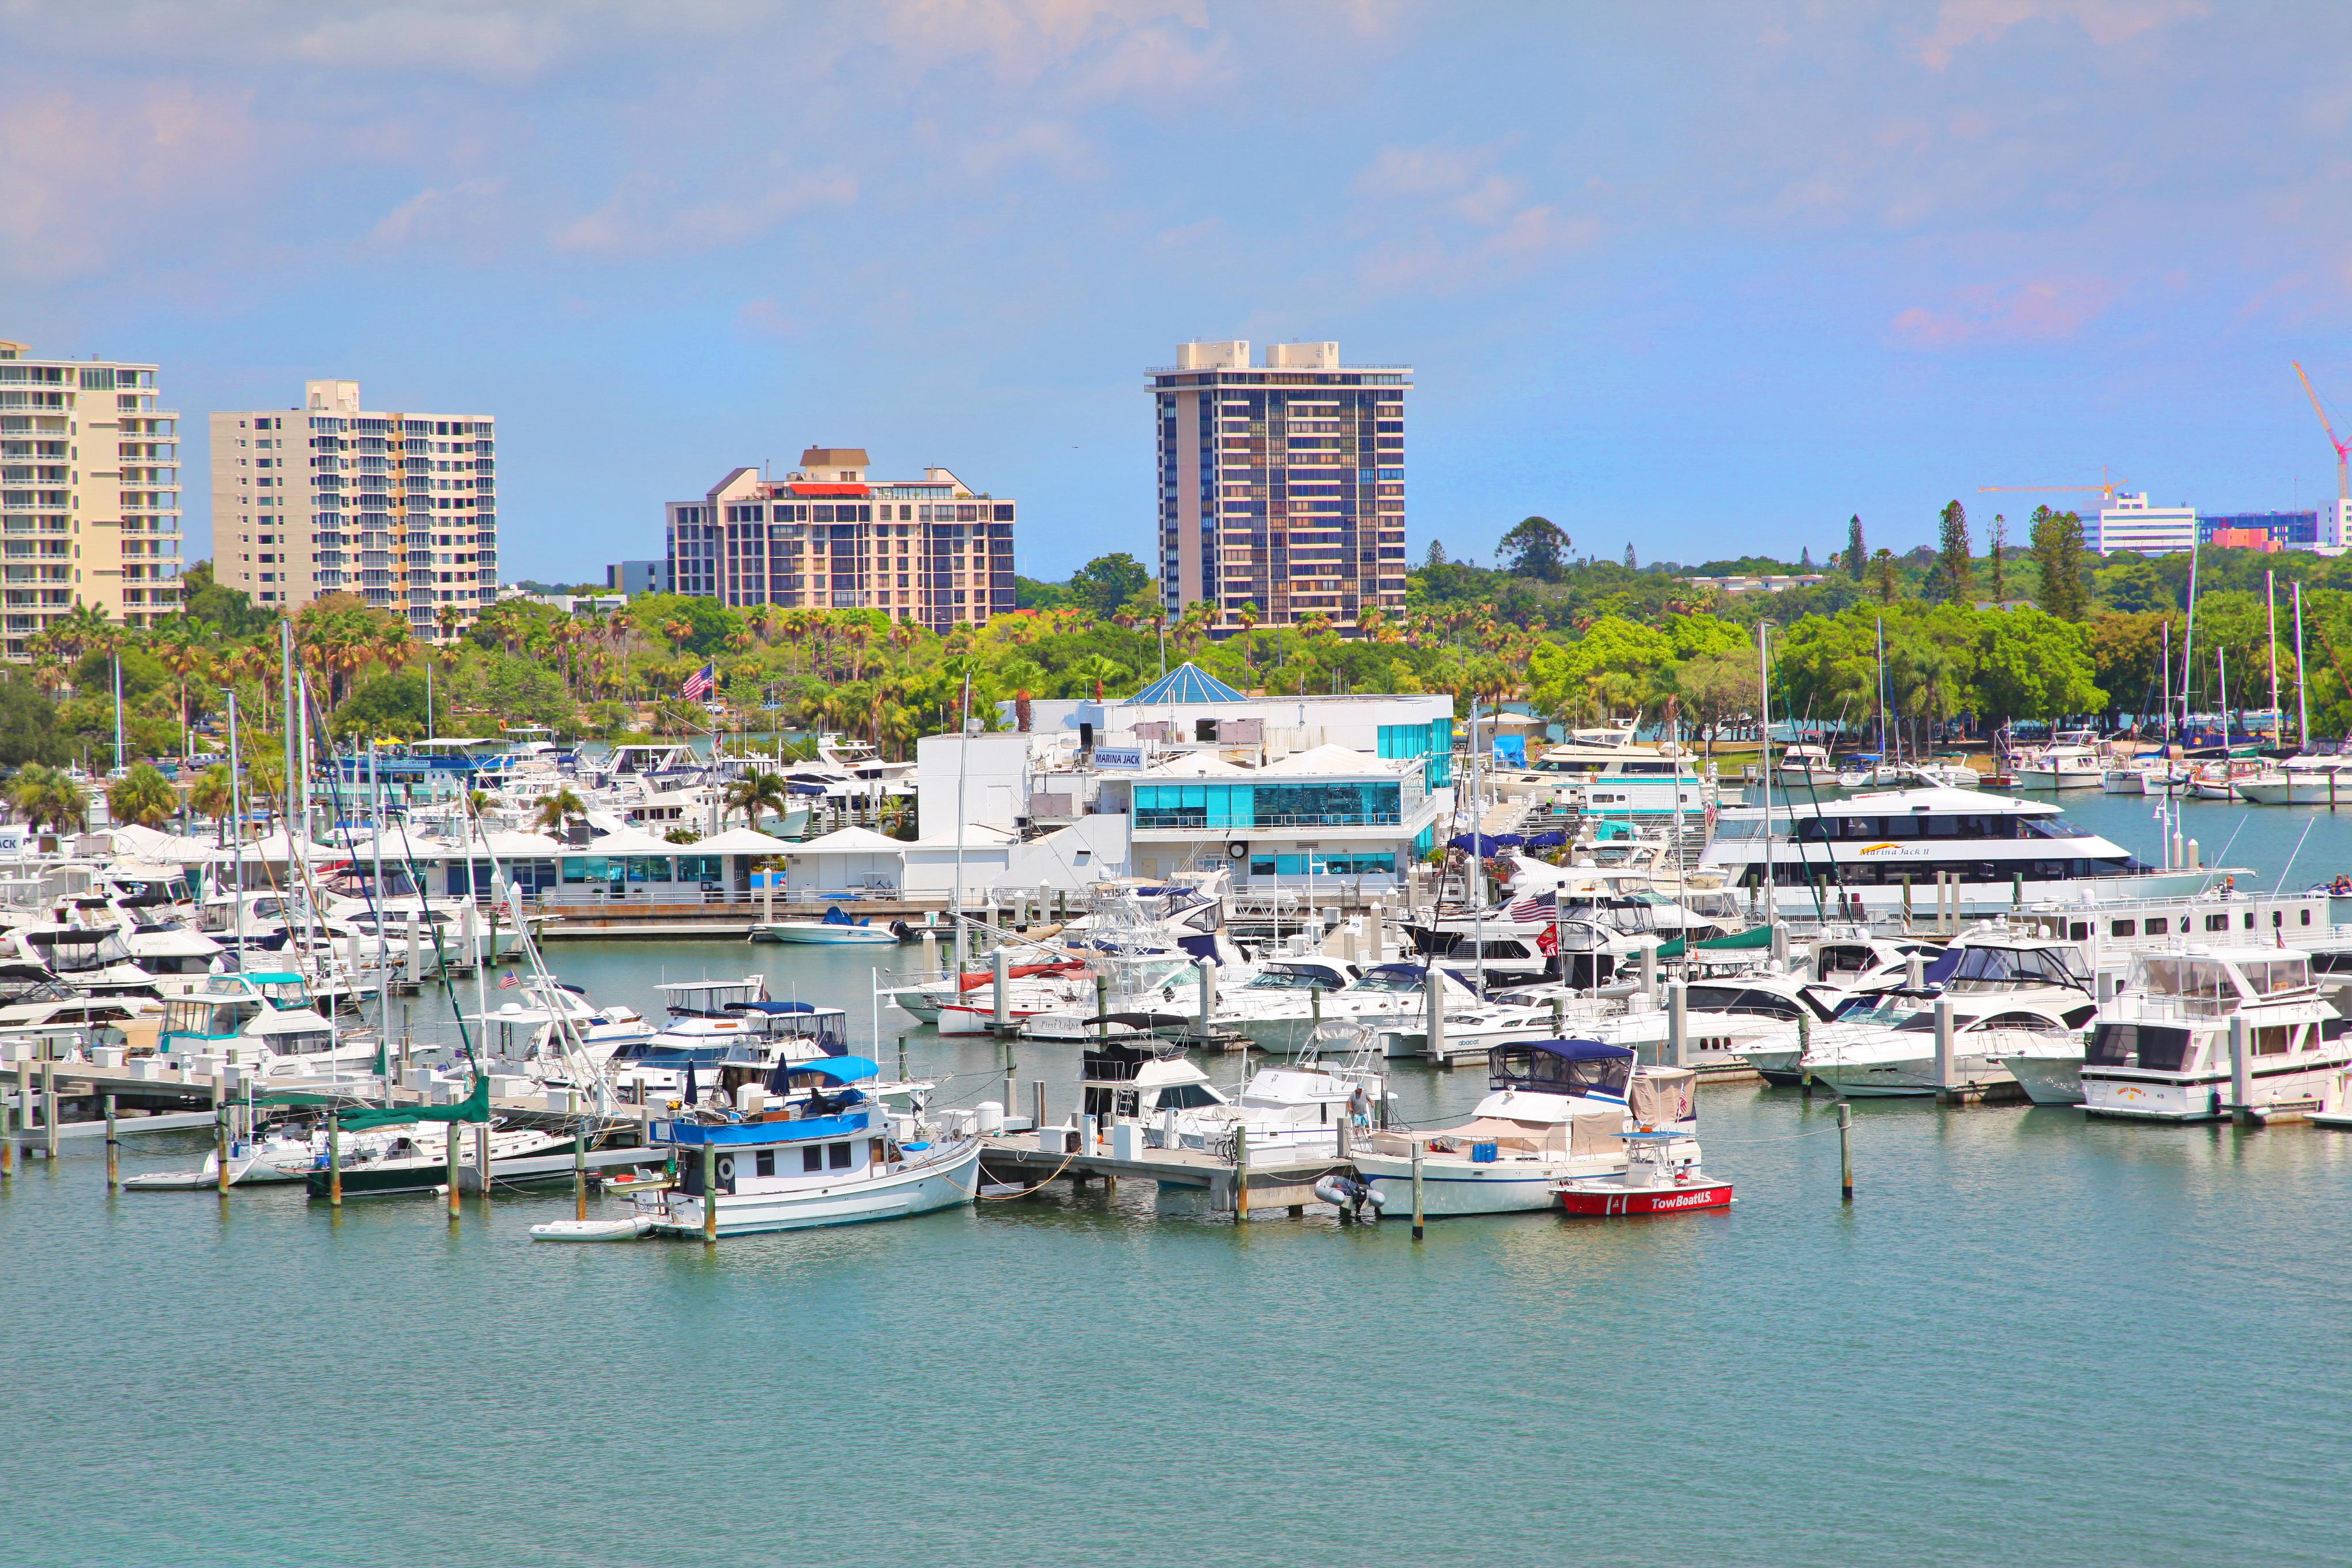 real estate agents Sarasota, FL / Sarasota, FL realtor